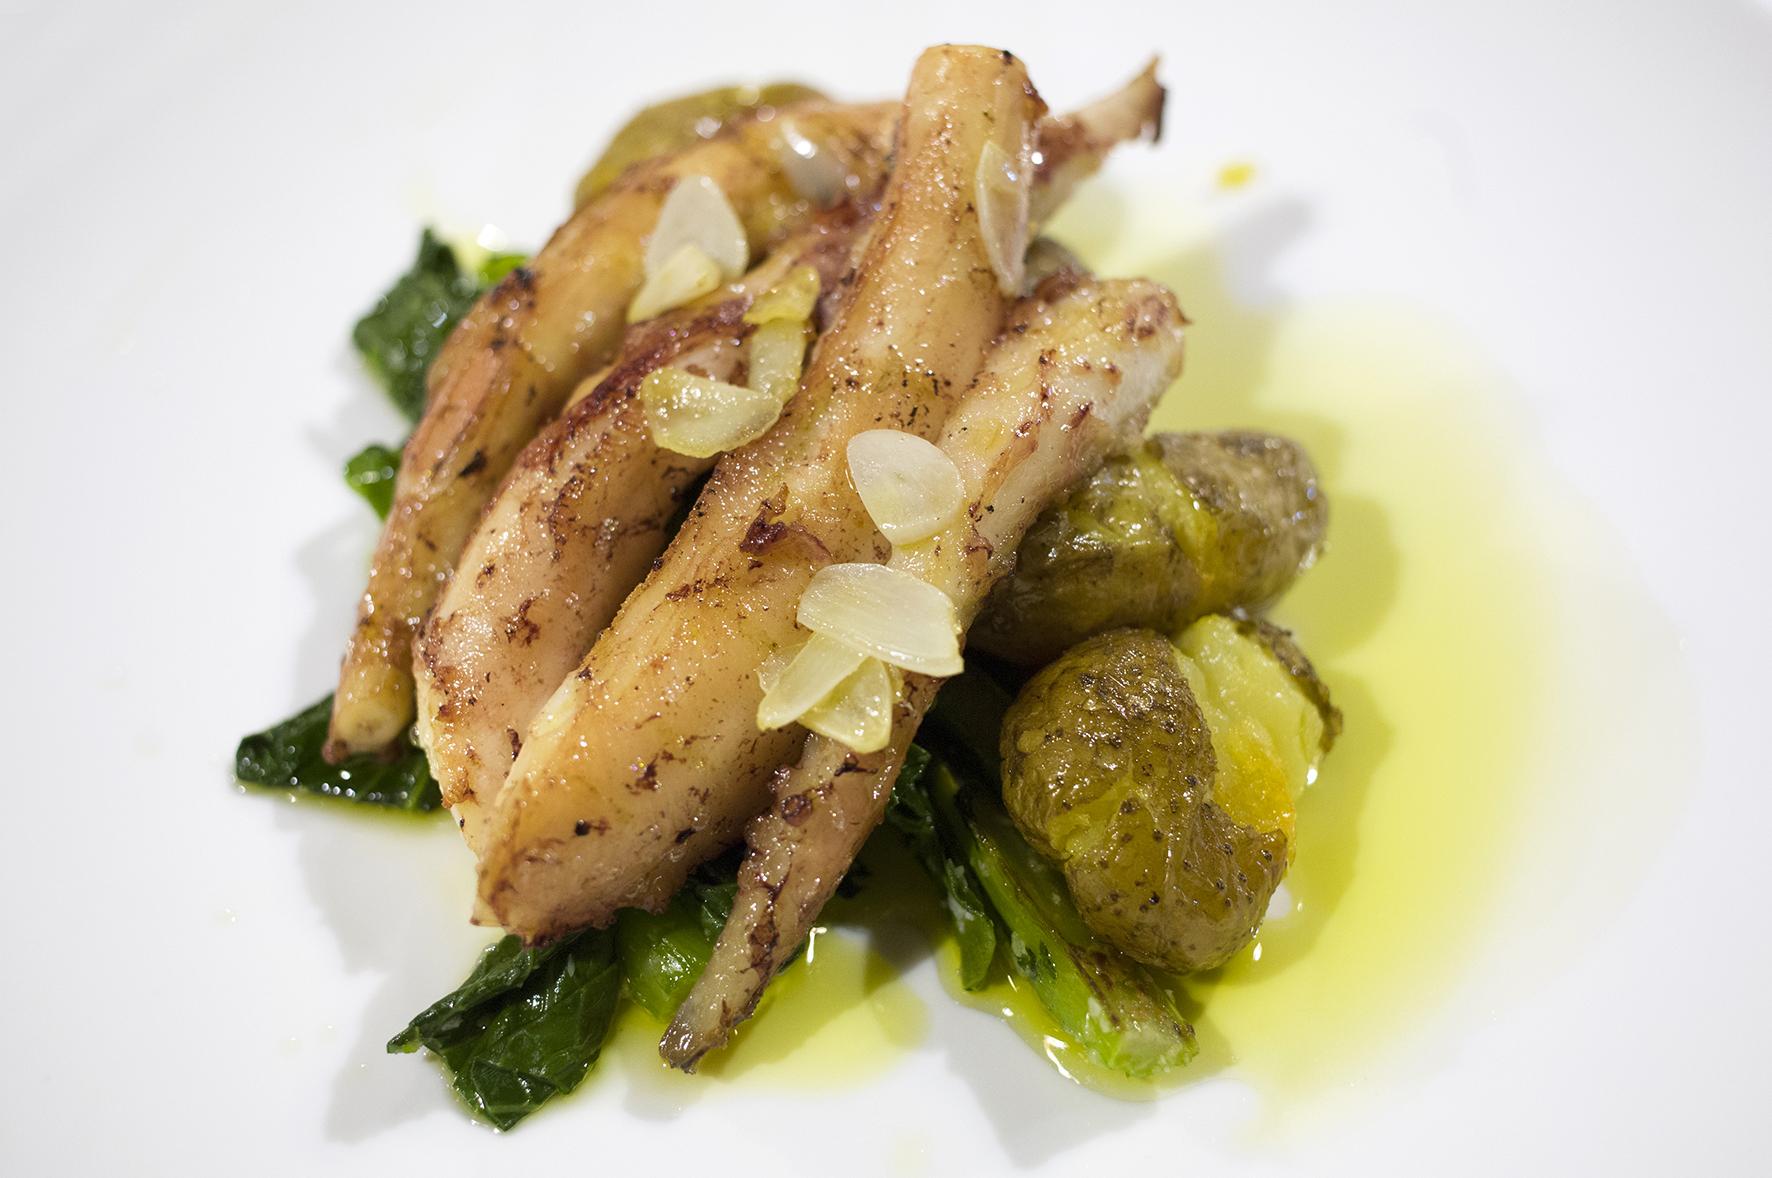 Grilled Octopus. 燒八爪魚伴烤薯及雜菜